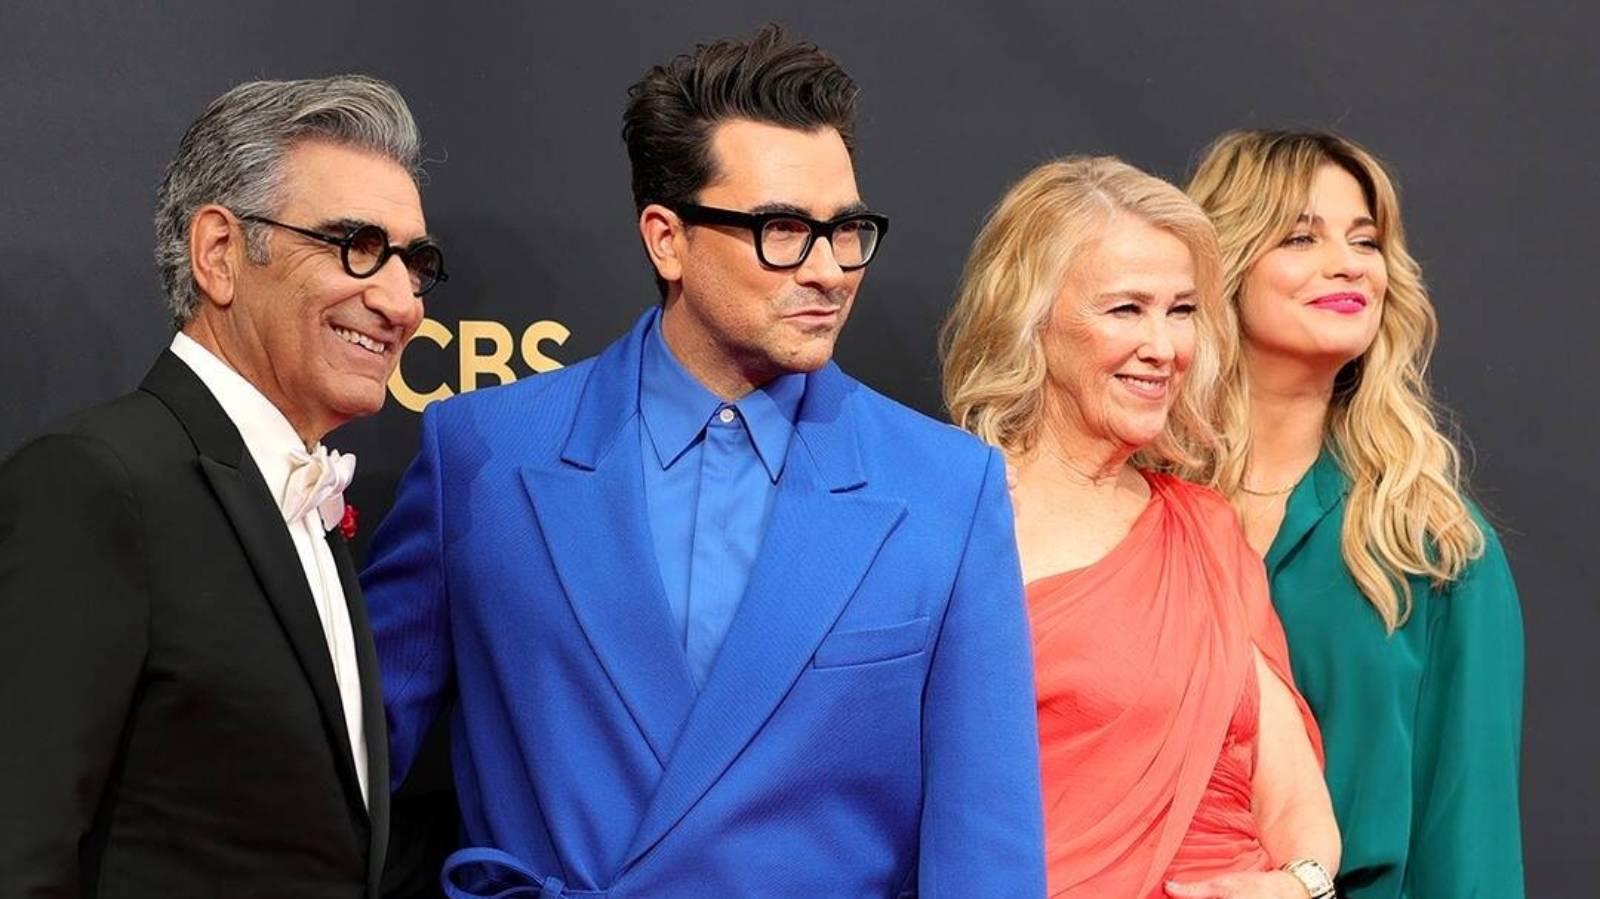 See the Schitt's Creek cast celebrate reunion at 2021 Emmys